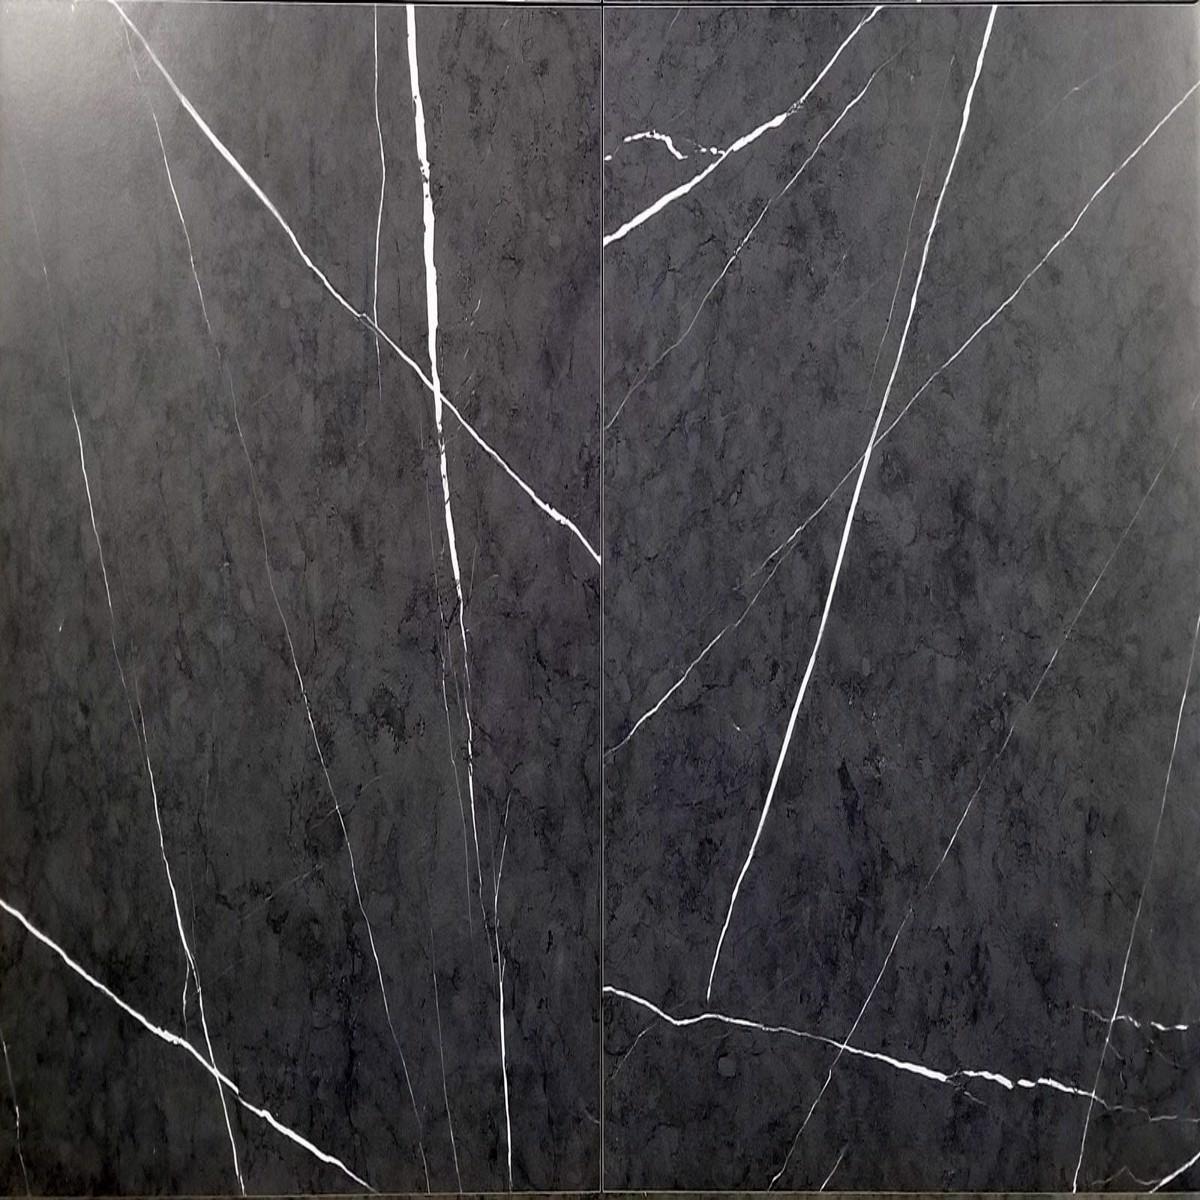 24x24 black white primo charcoalsmooth matt floor wall porcelain tile